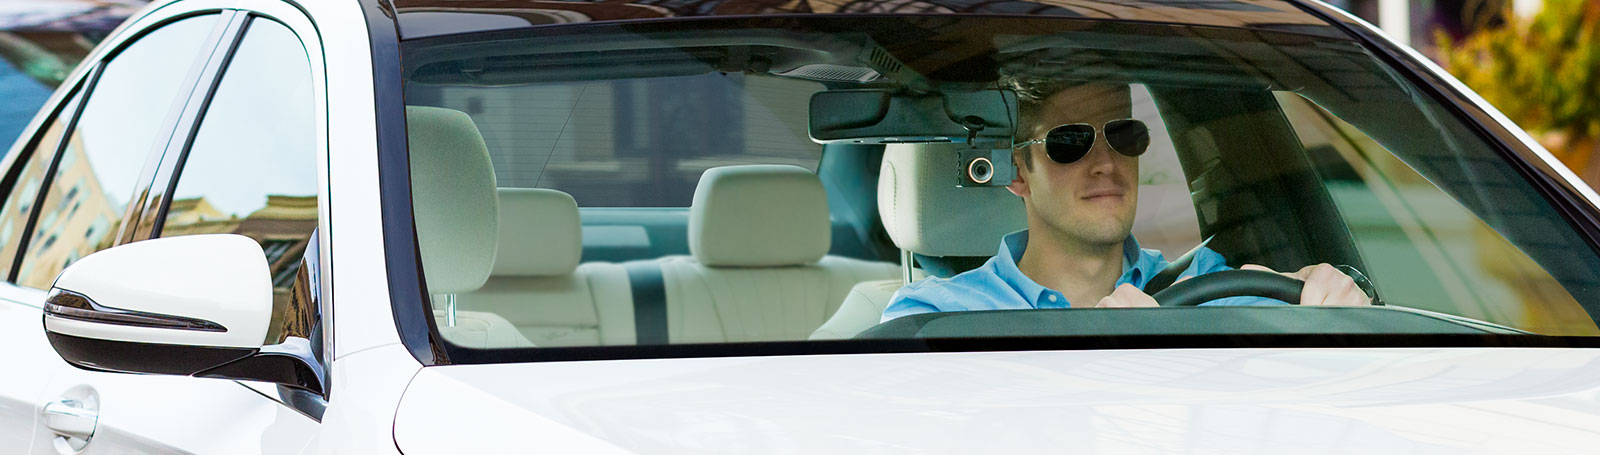 Dash cams, backup cameras and action cameras by Garmin.